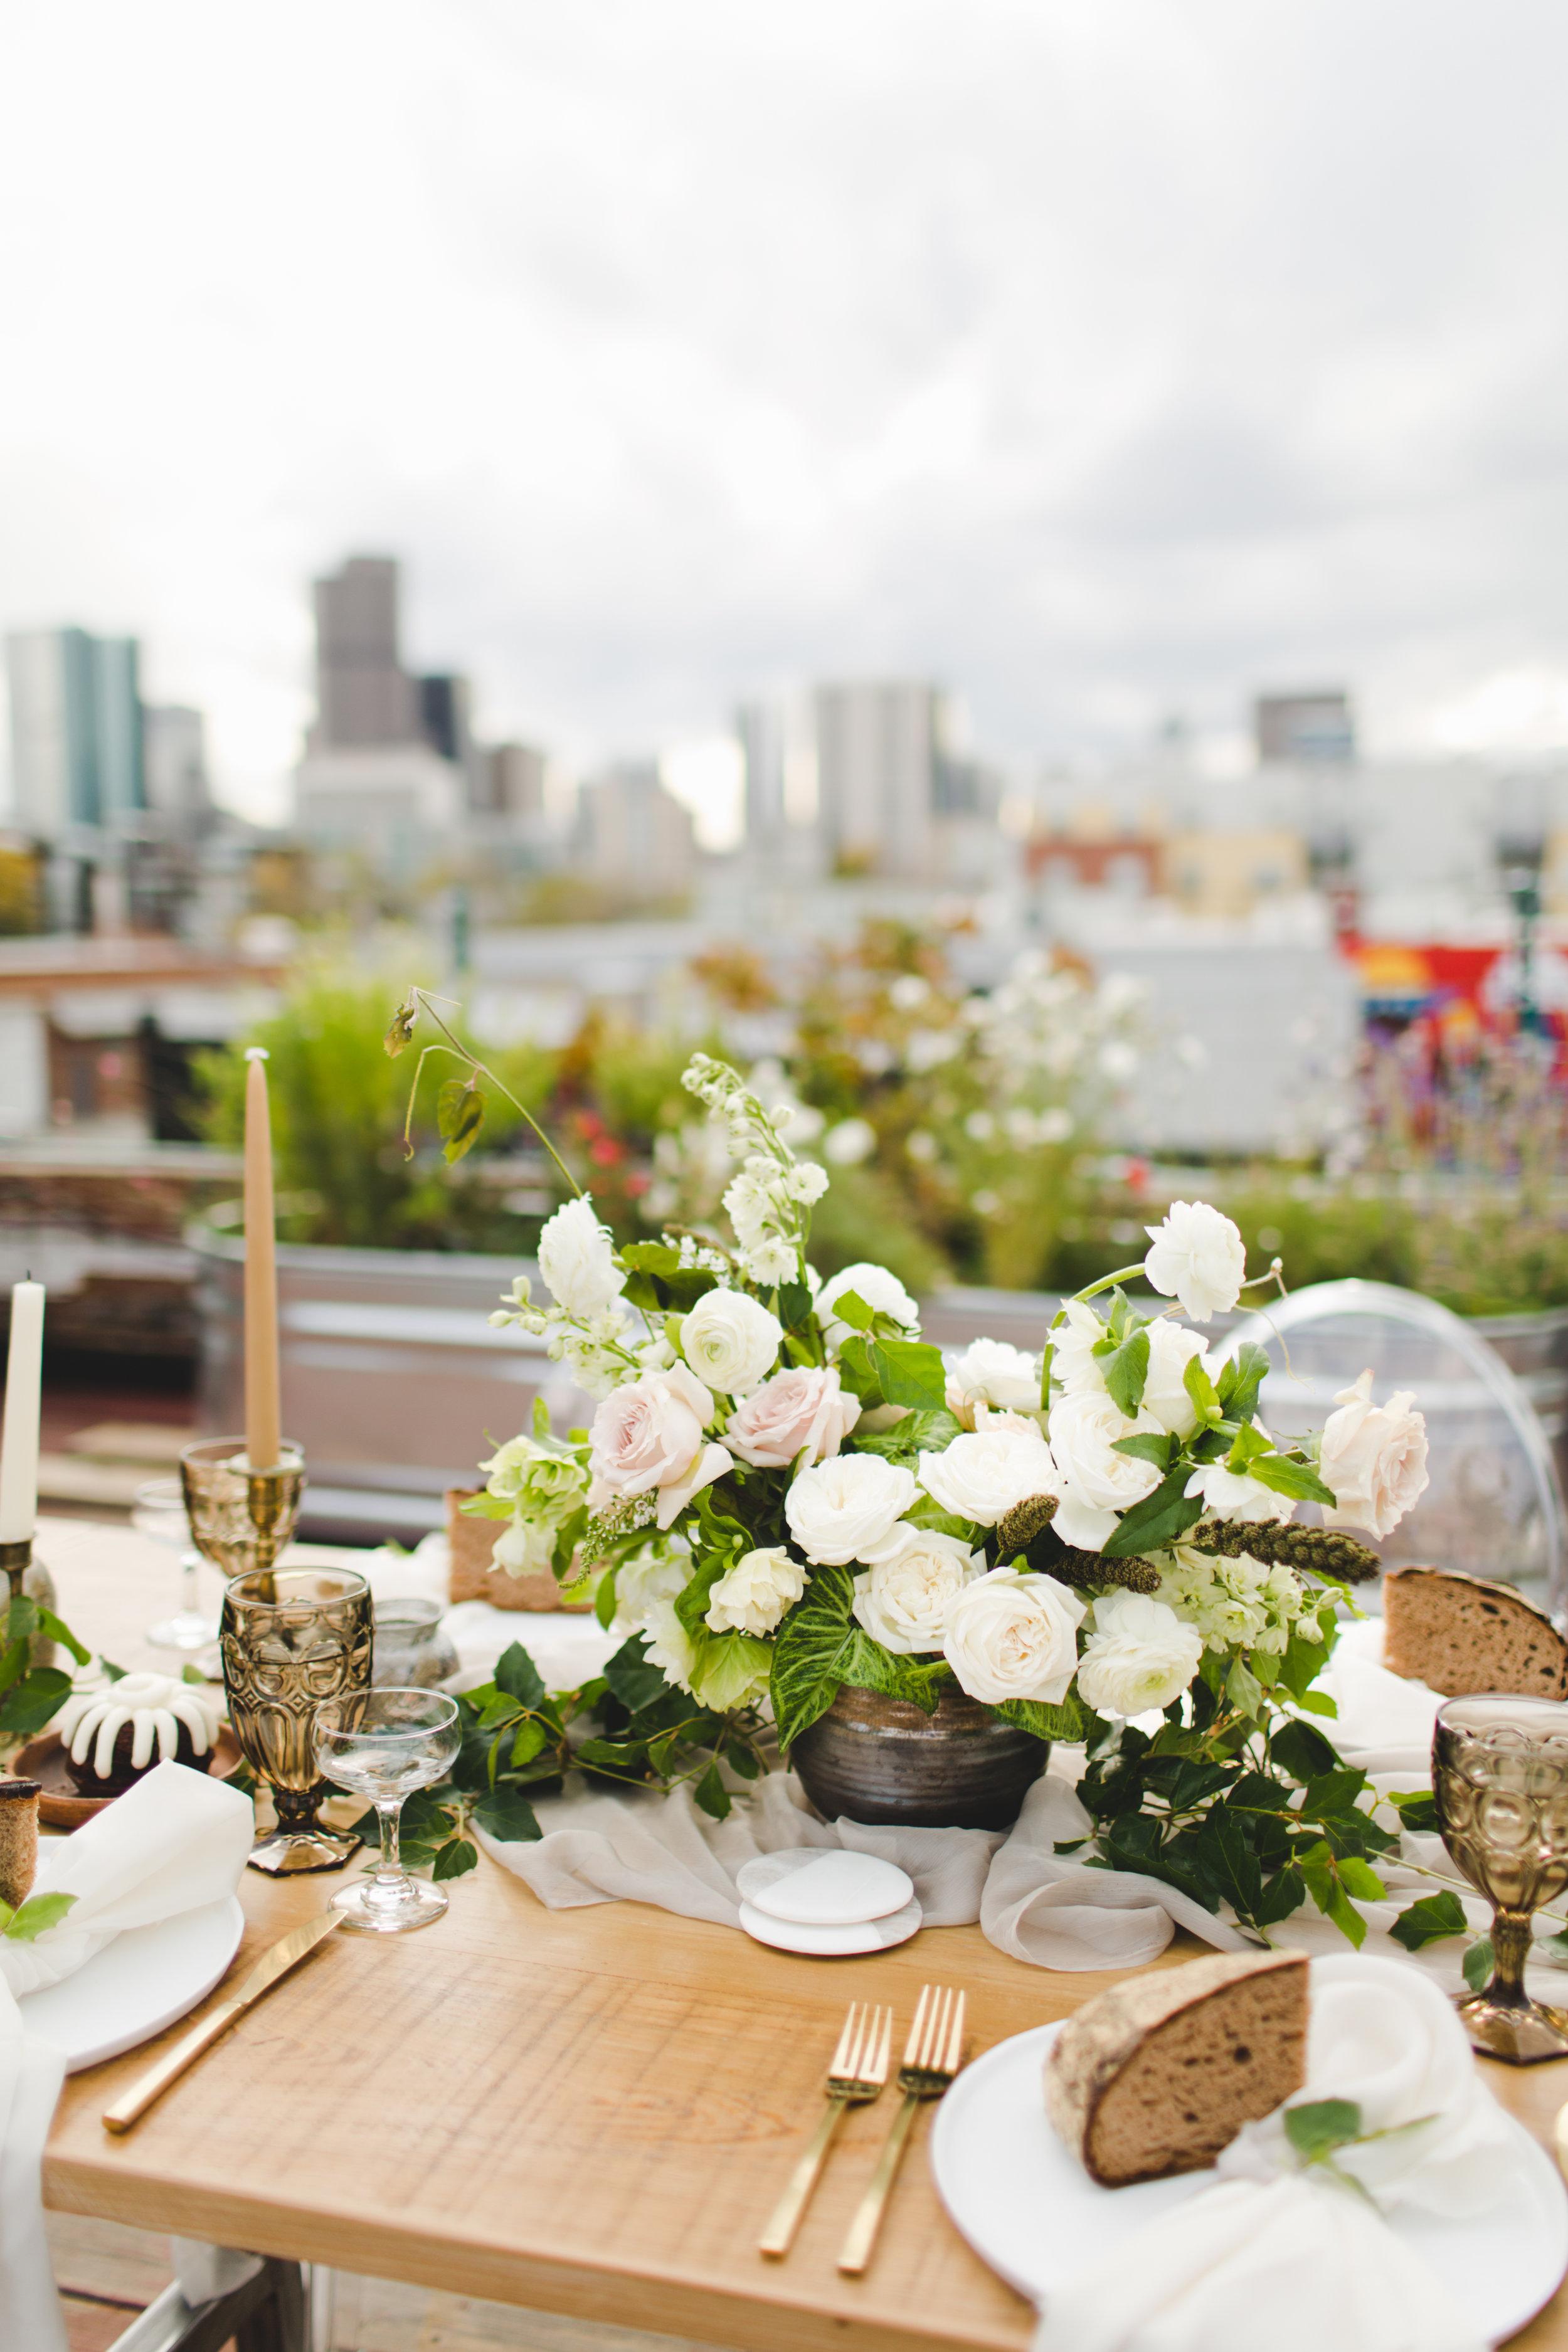 denver-rooftop-dinner-party-planner8.jpg